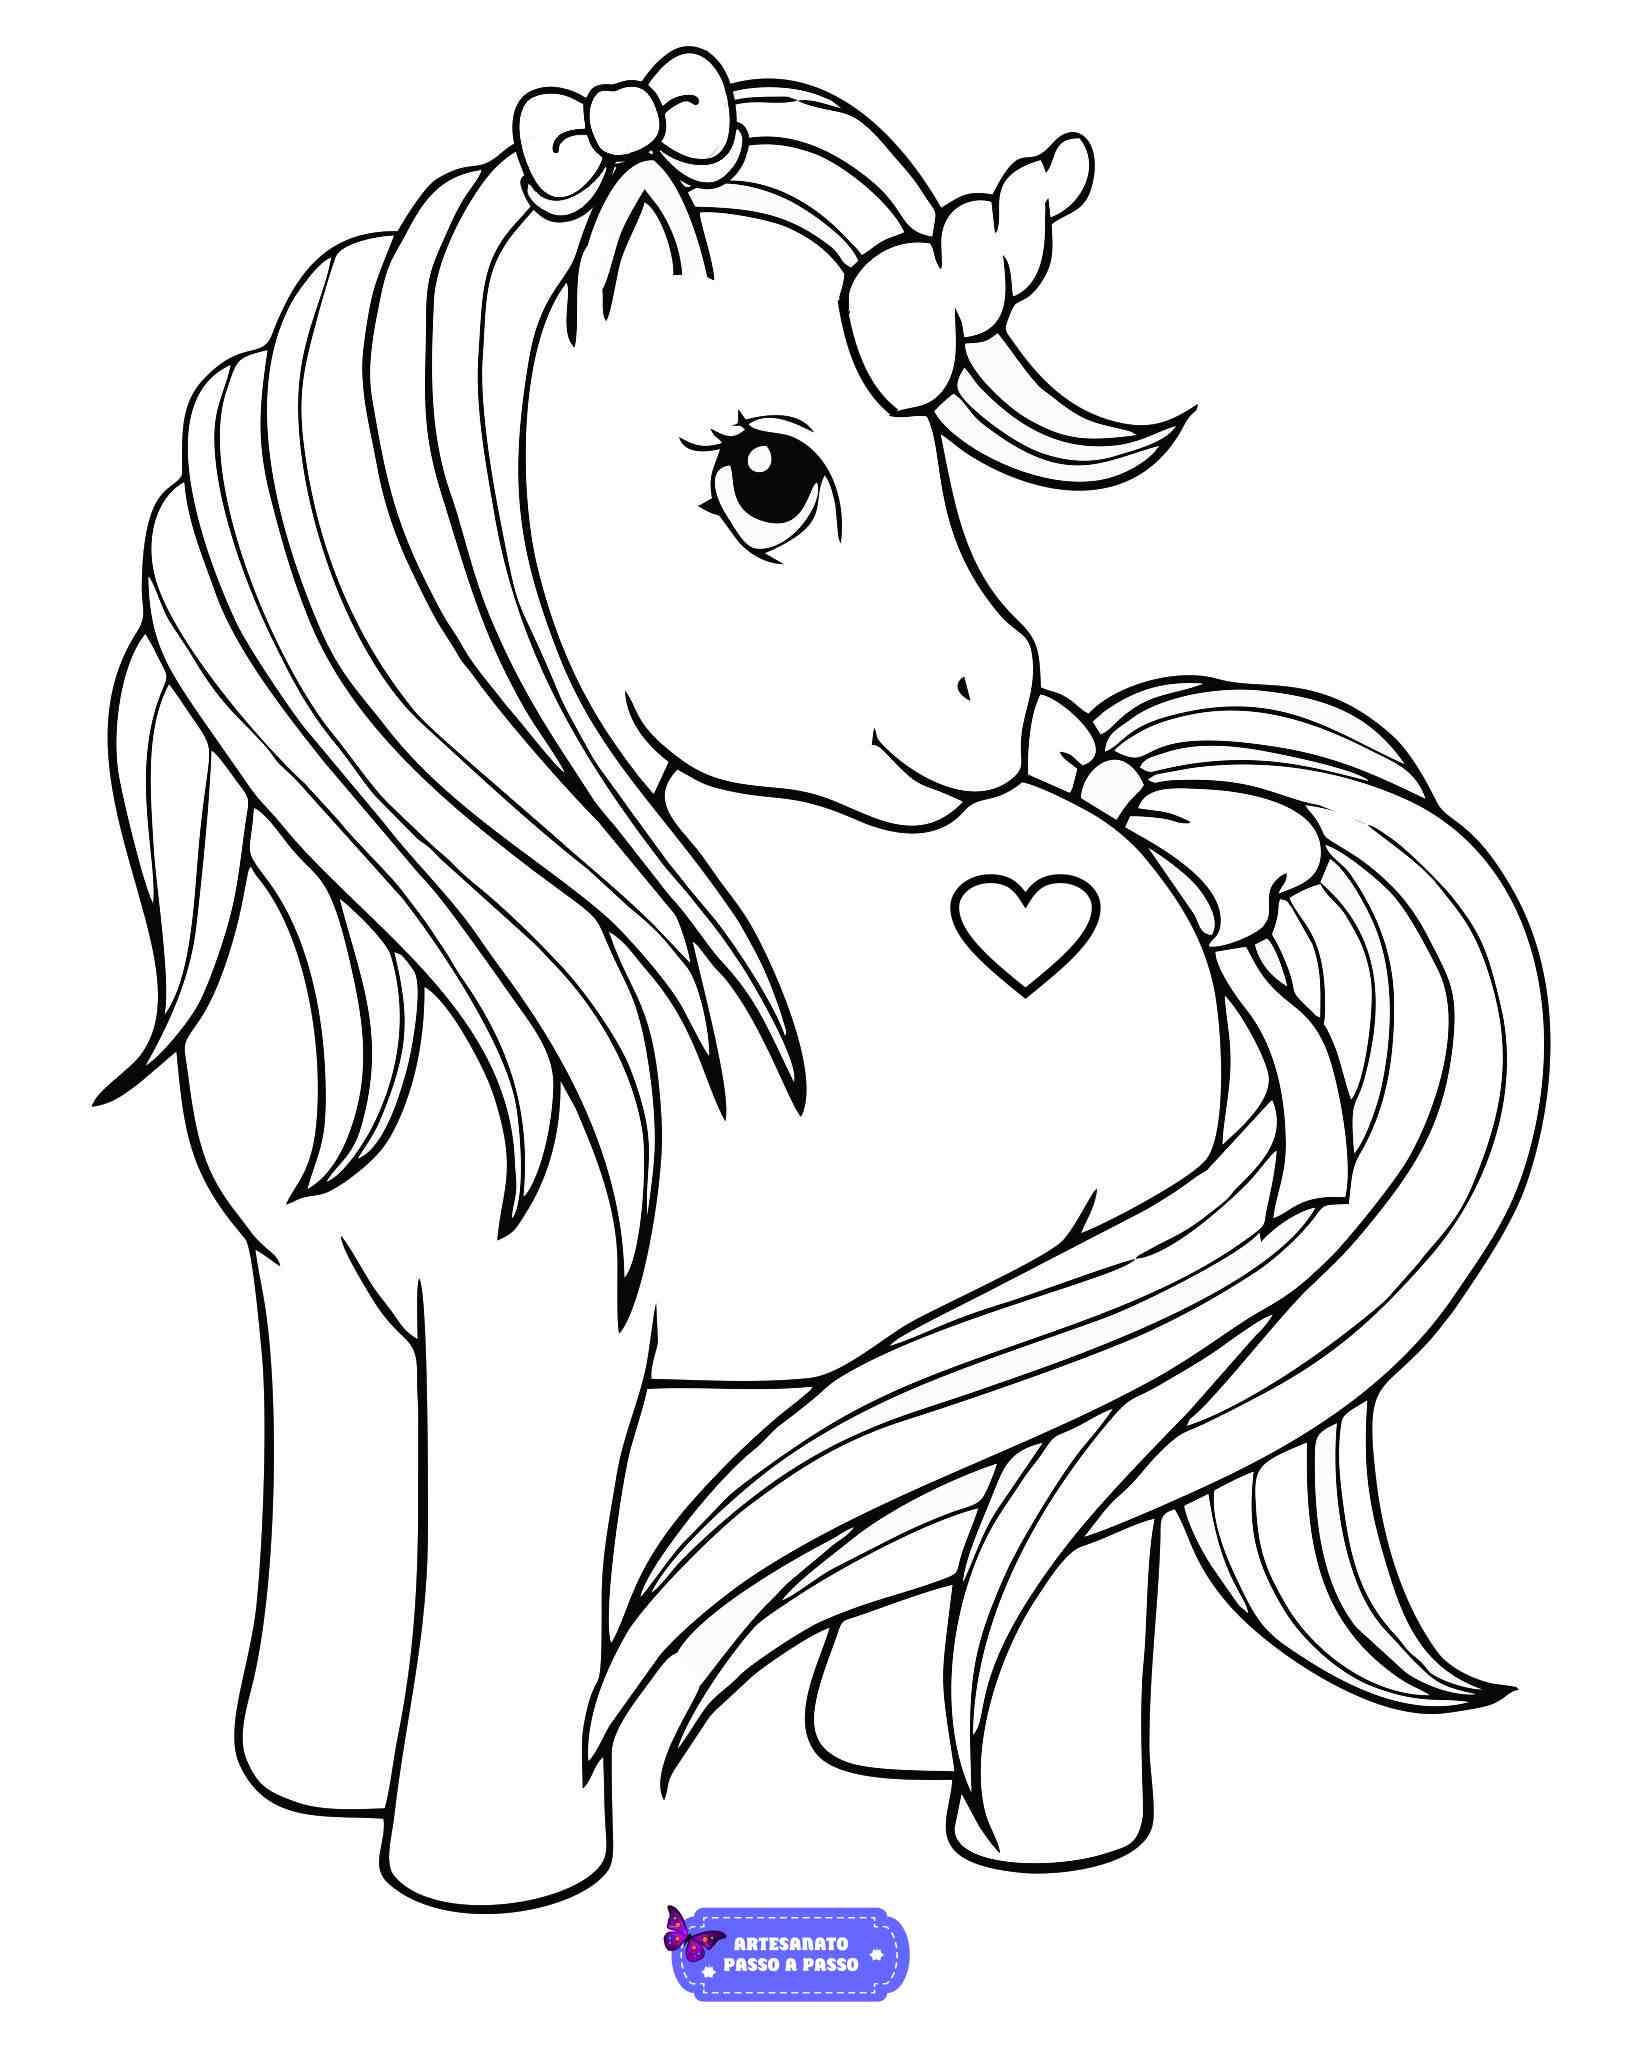 Desenho para colorir de unicórnio